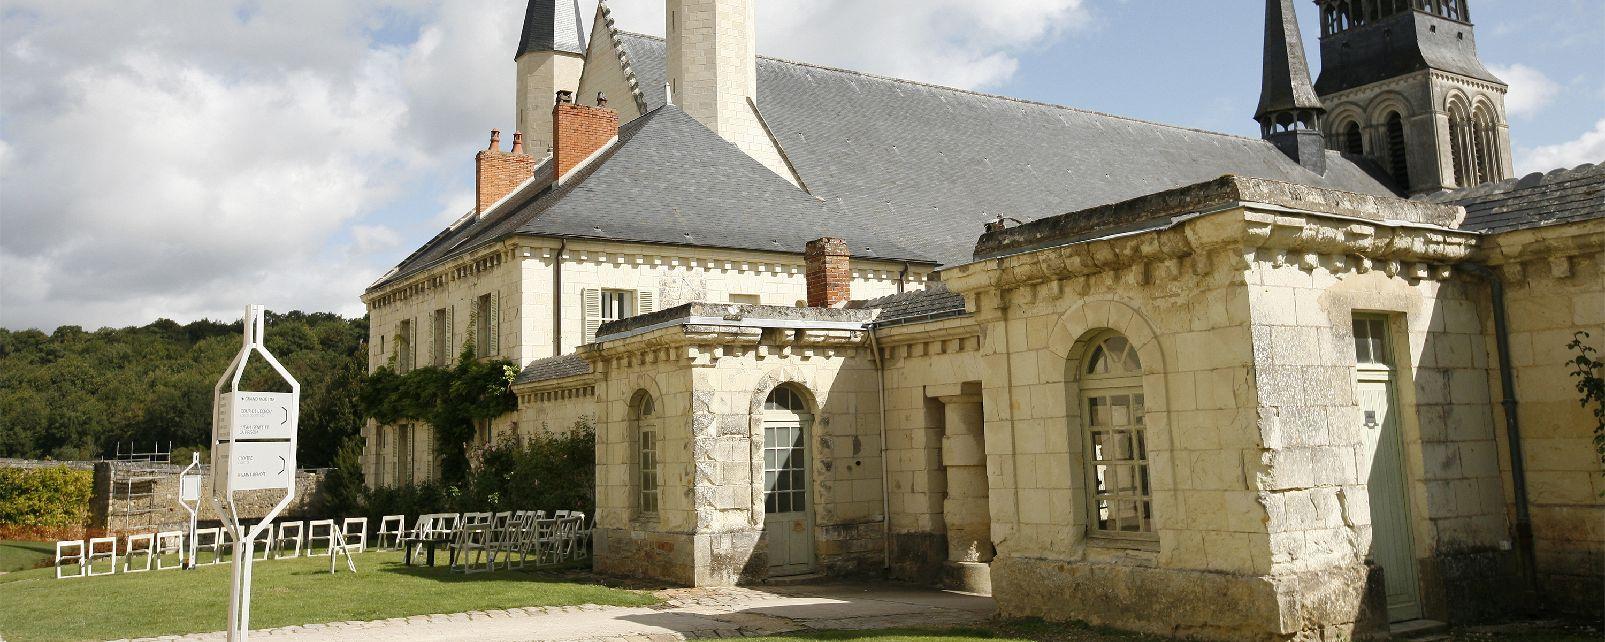 H tel abbaye royale de fontevraud - Hotel abbaye de fontevraud ...